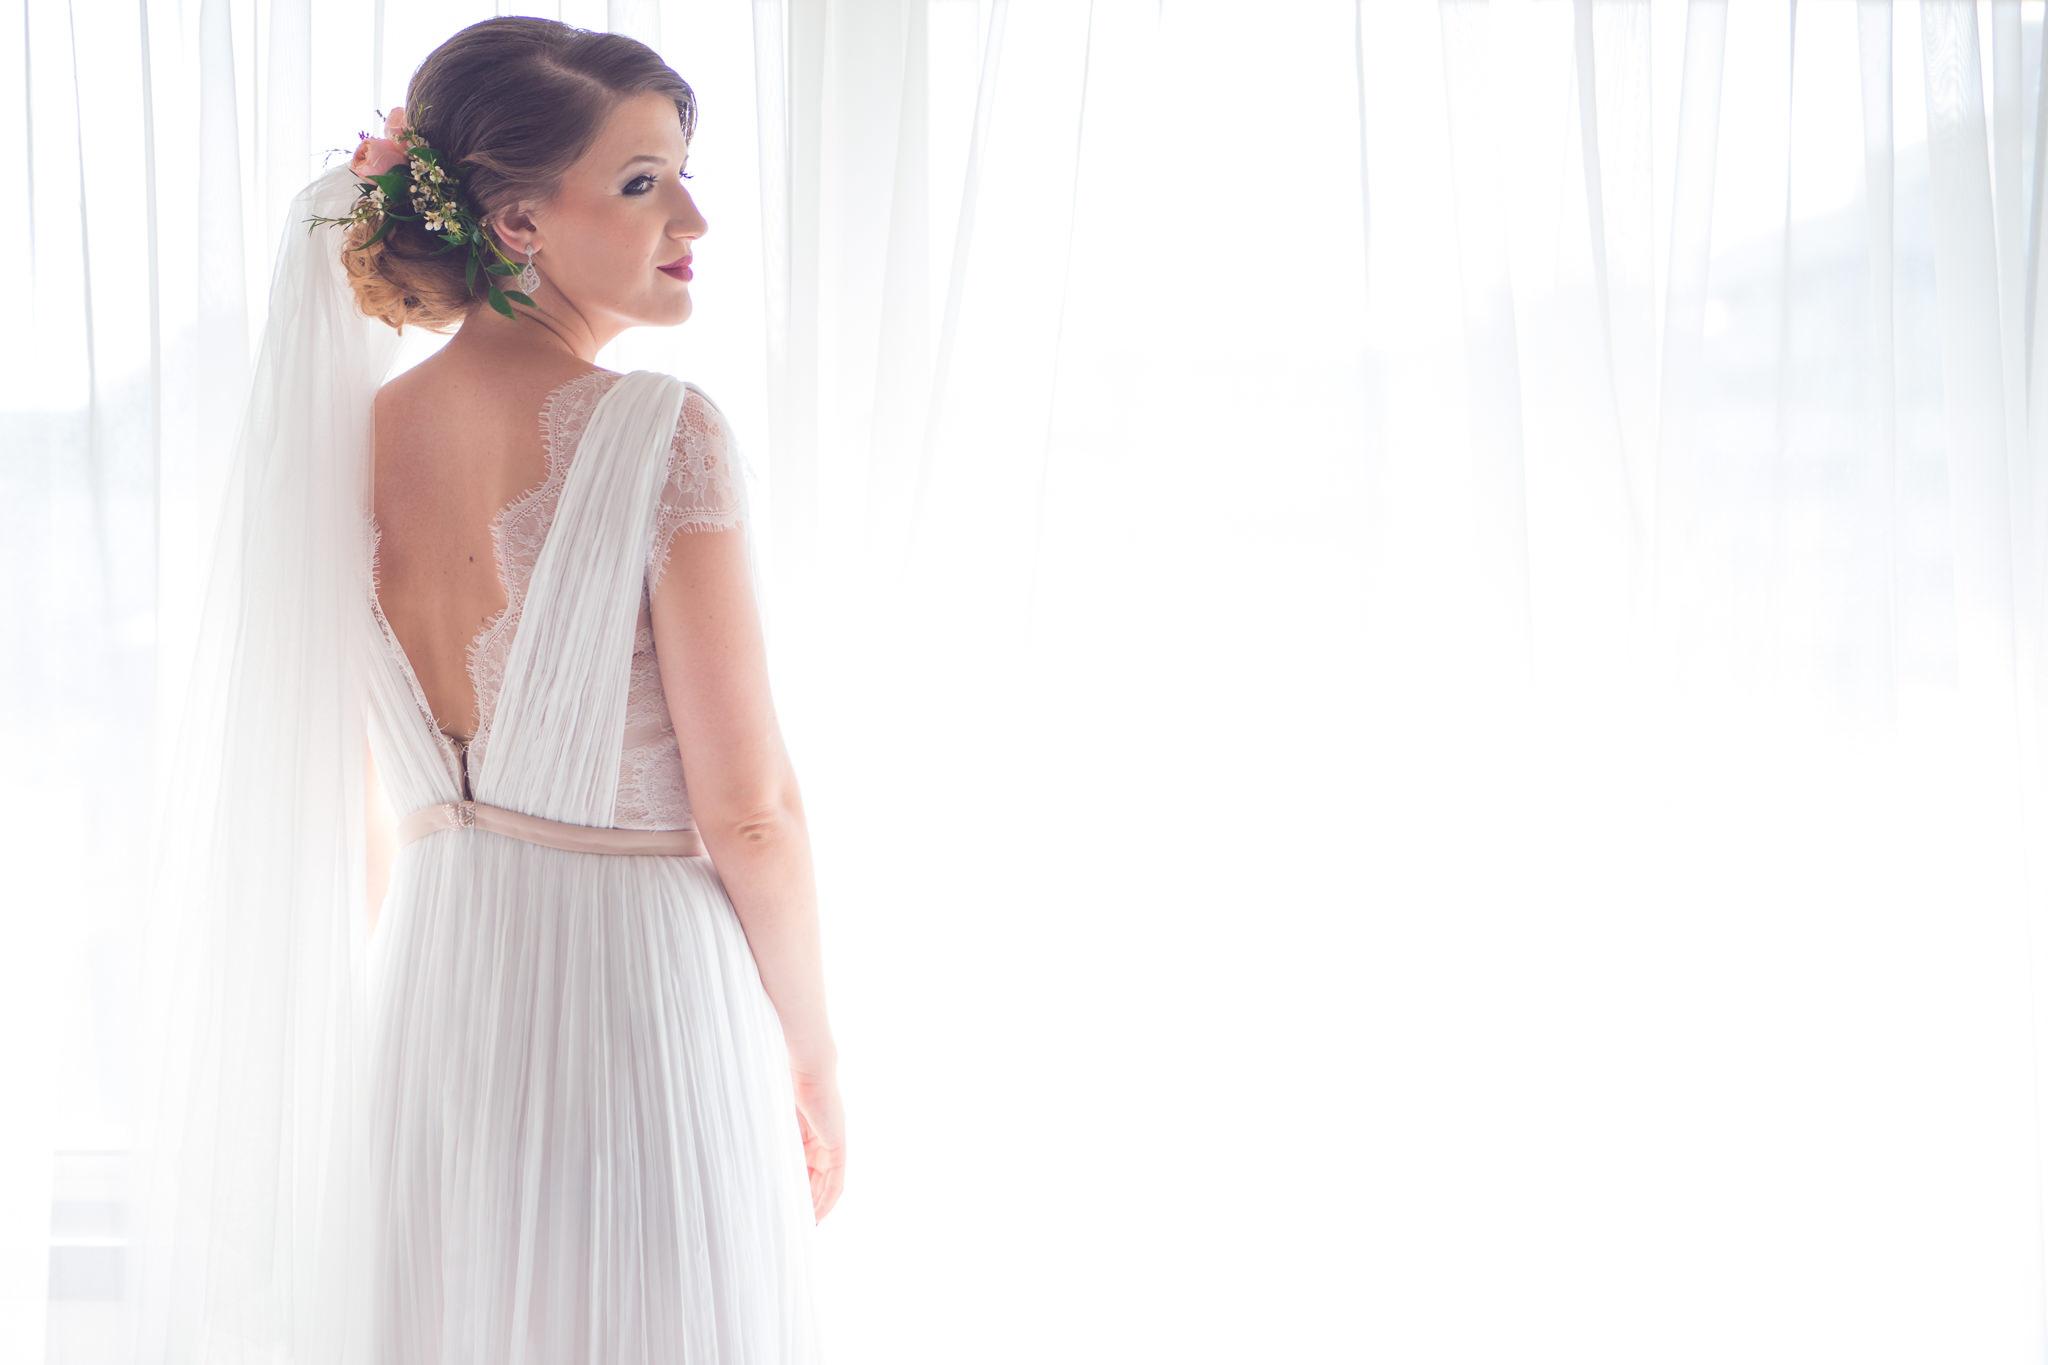 Fotografii nunta - Ploiesti 11